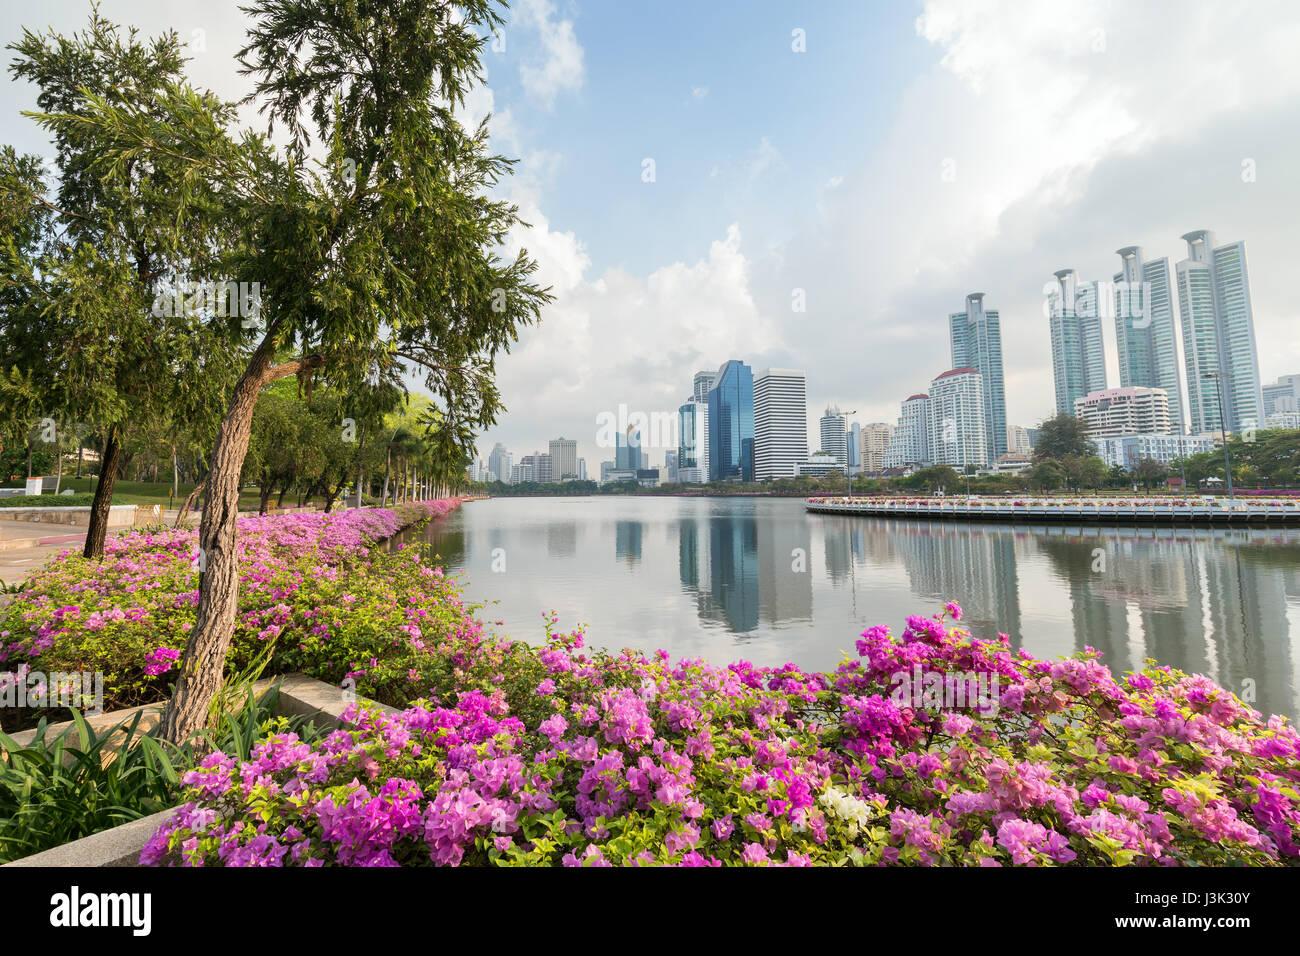 Blooming flowerbeds at the Benjakiti (Benjakitti) Park and modern skyscrapers in Bangkok, Thailand. - Stock Image